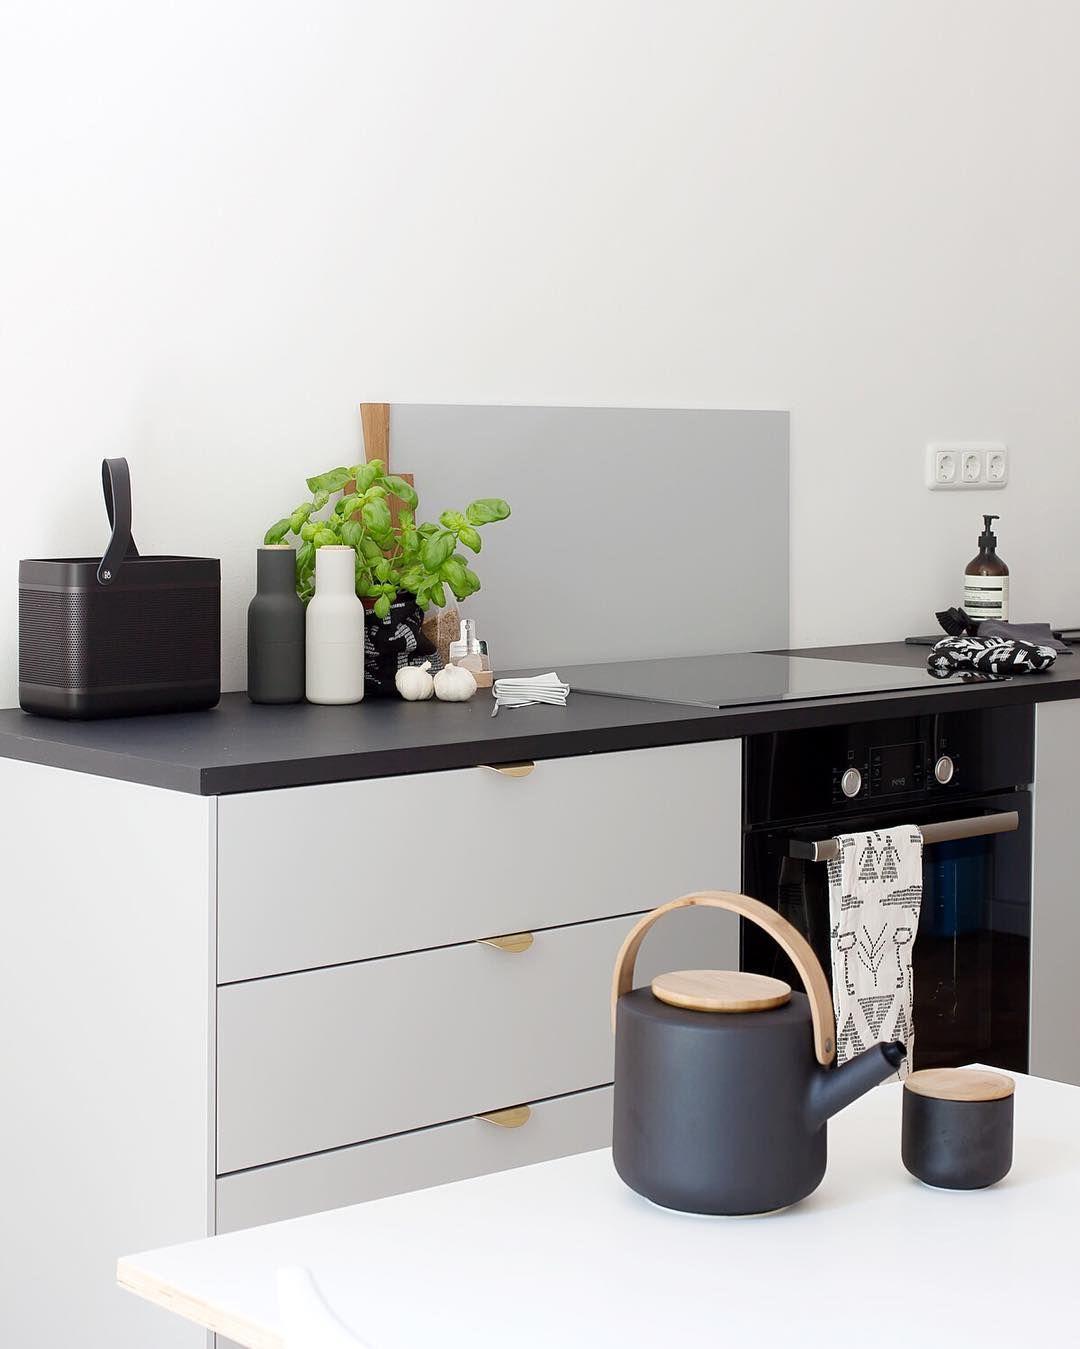 Kitchen Design Handles: A Glimpse Of Our New Kitchen